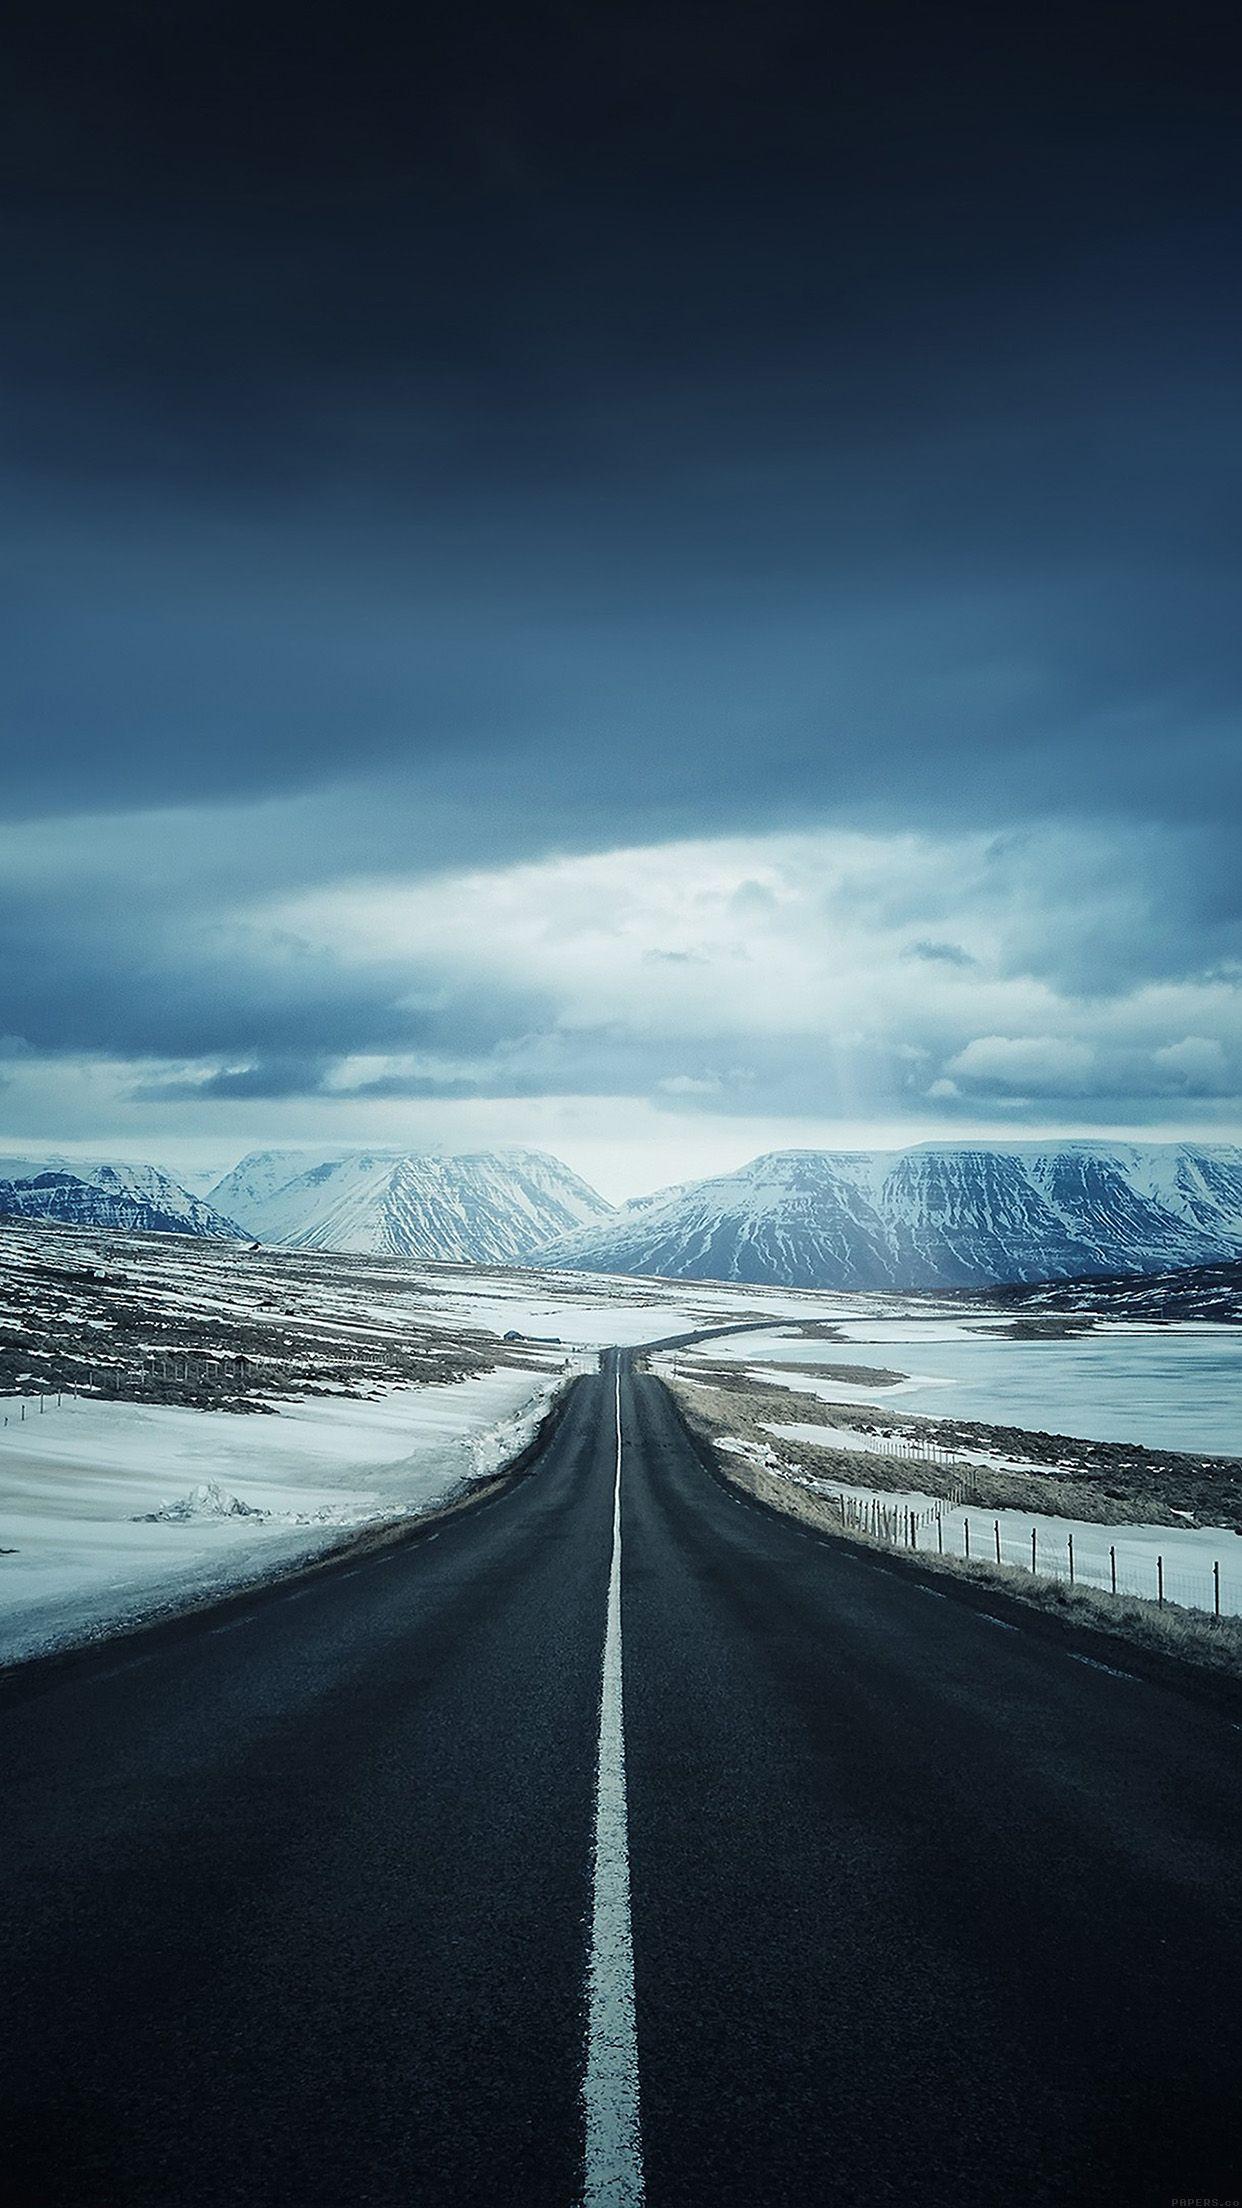 Lonely Mountain Valley Road Iphone 6 Plus Hd Wallpaper Beautiful Roads Travel Wallpaper Mountain Wallpaper